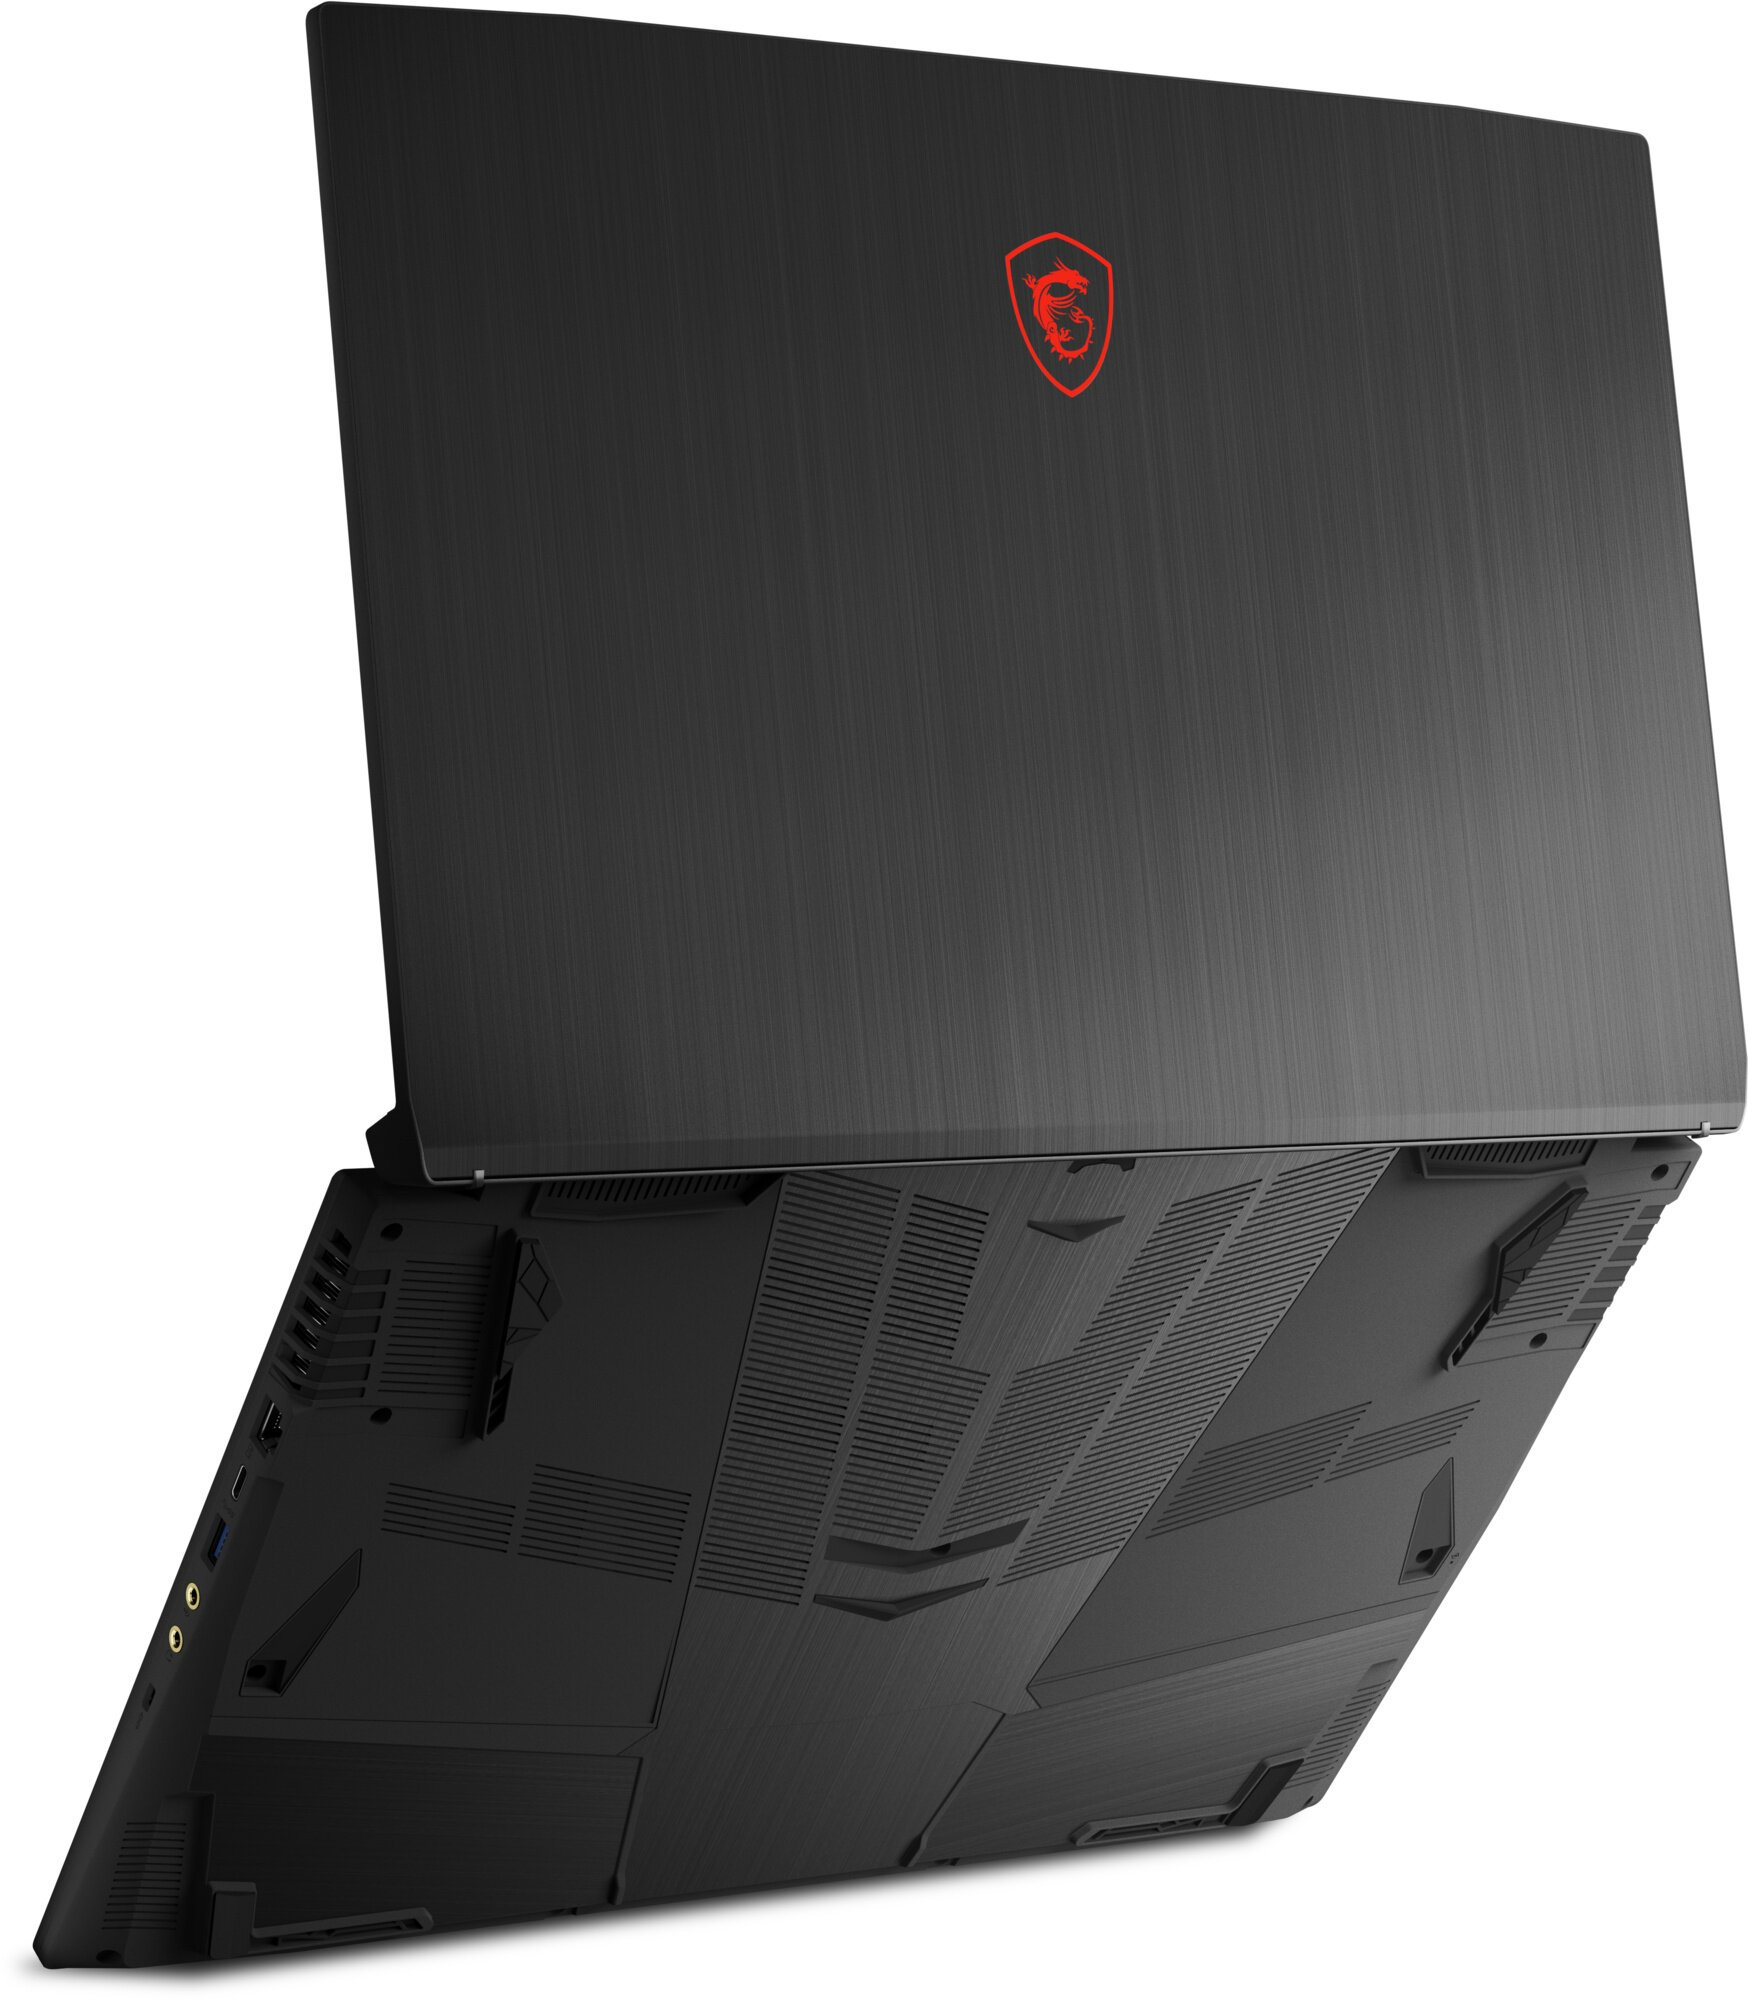 MSI GF75 Thin 9SC-038BE